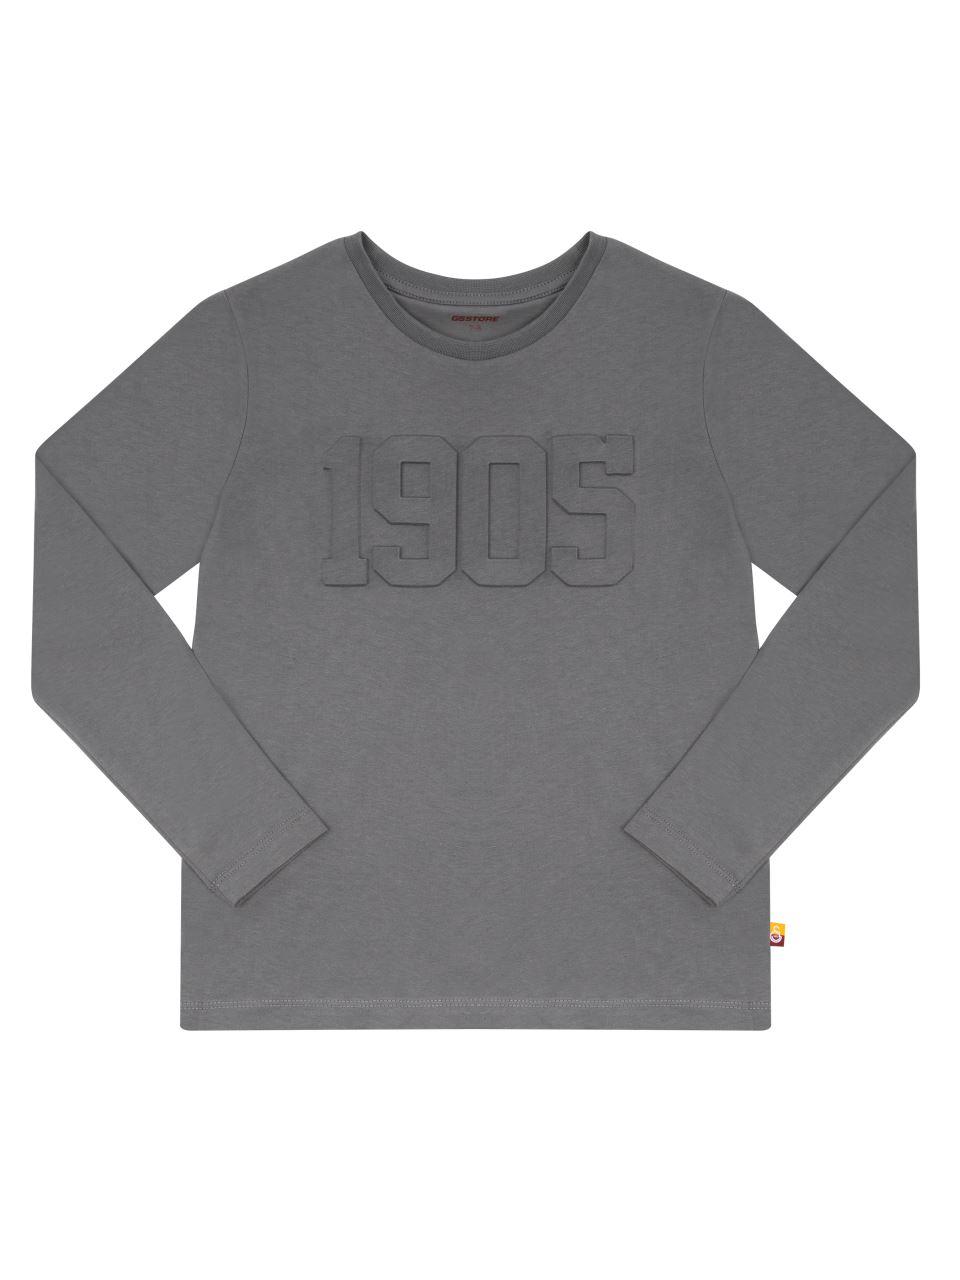 C95052 T-shirt